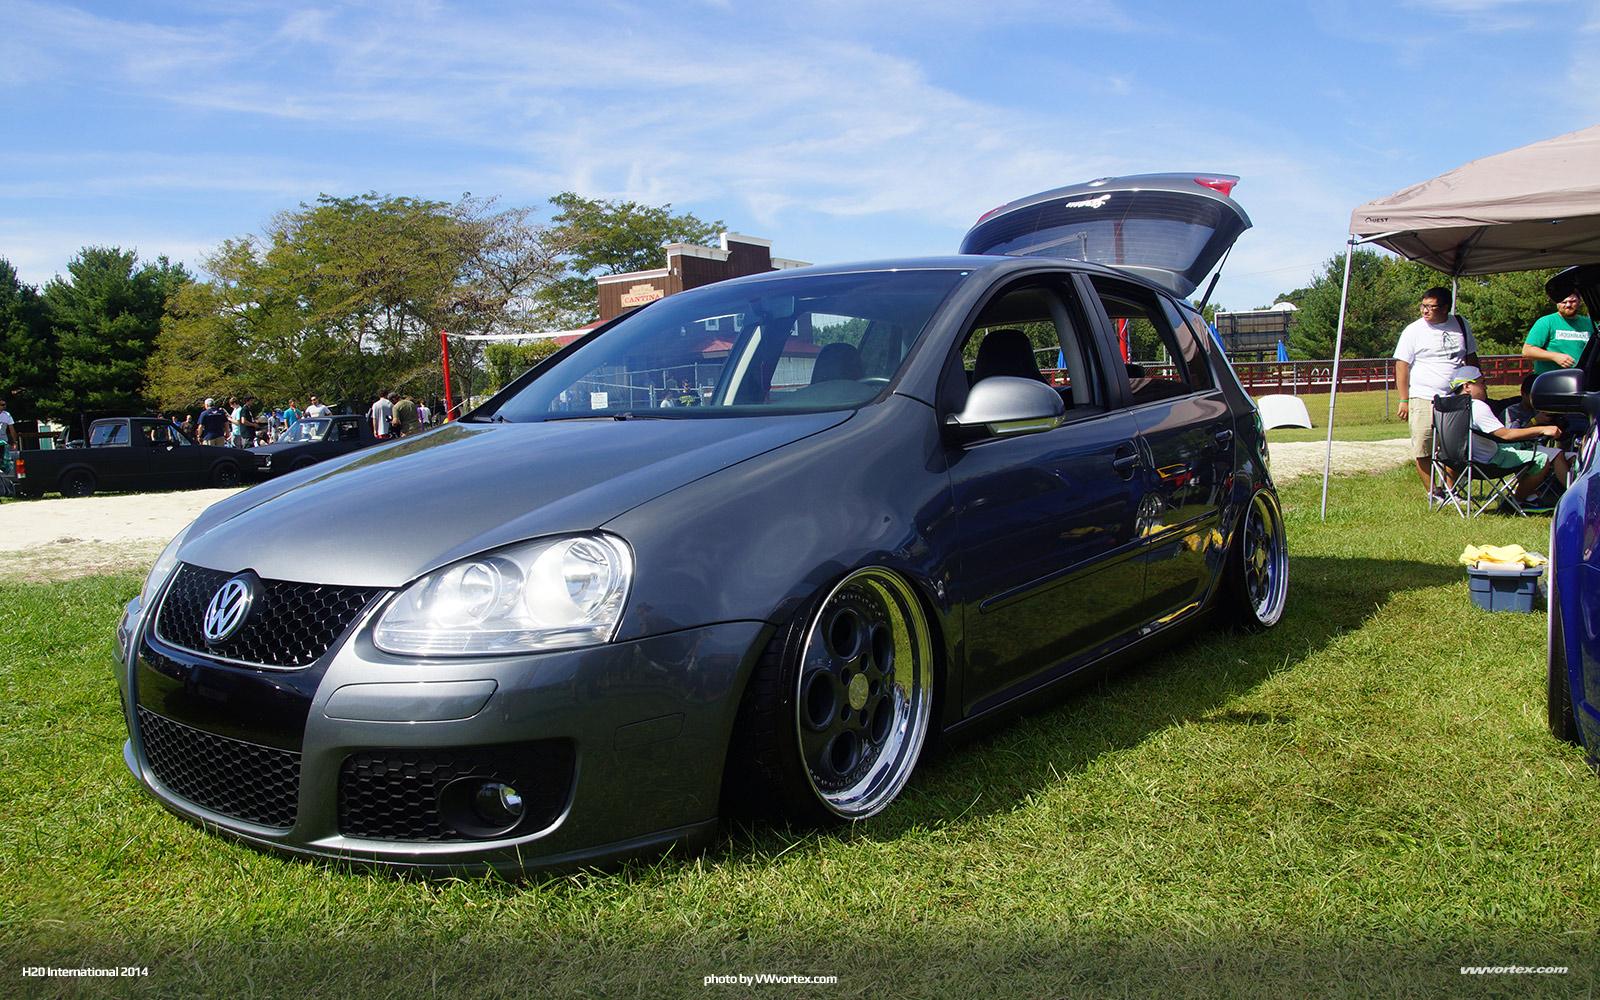 2014-H20i-H20-International-VW-Volkswagen-Audi-658